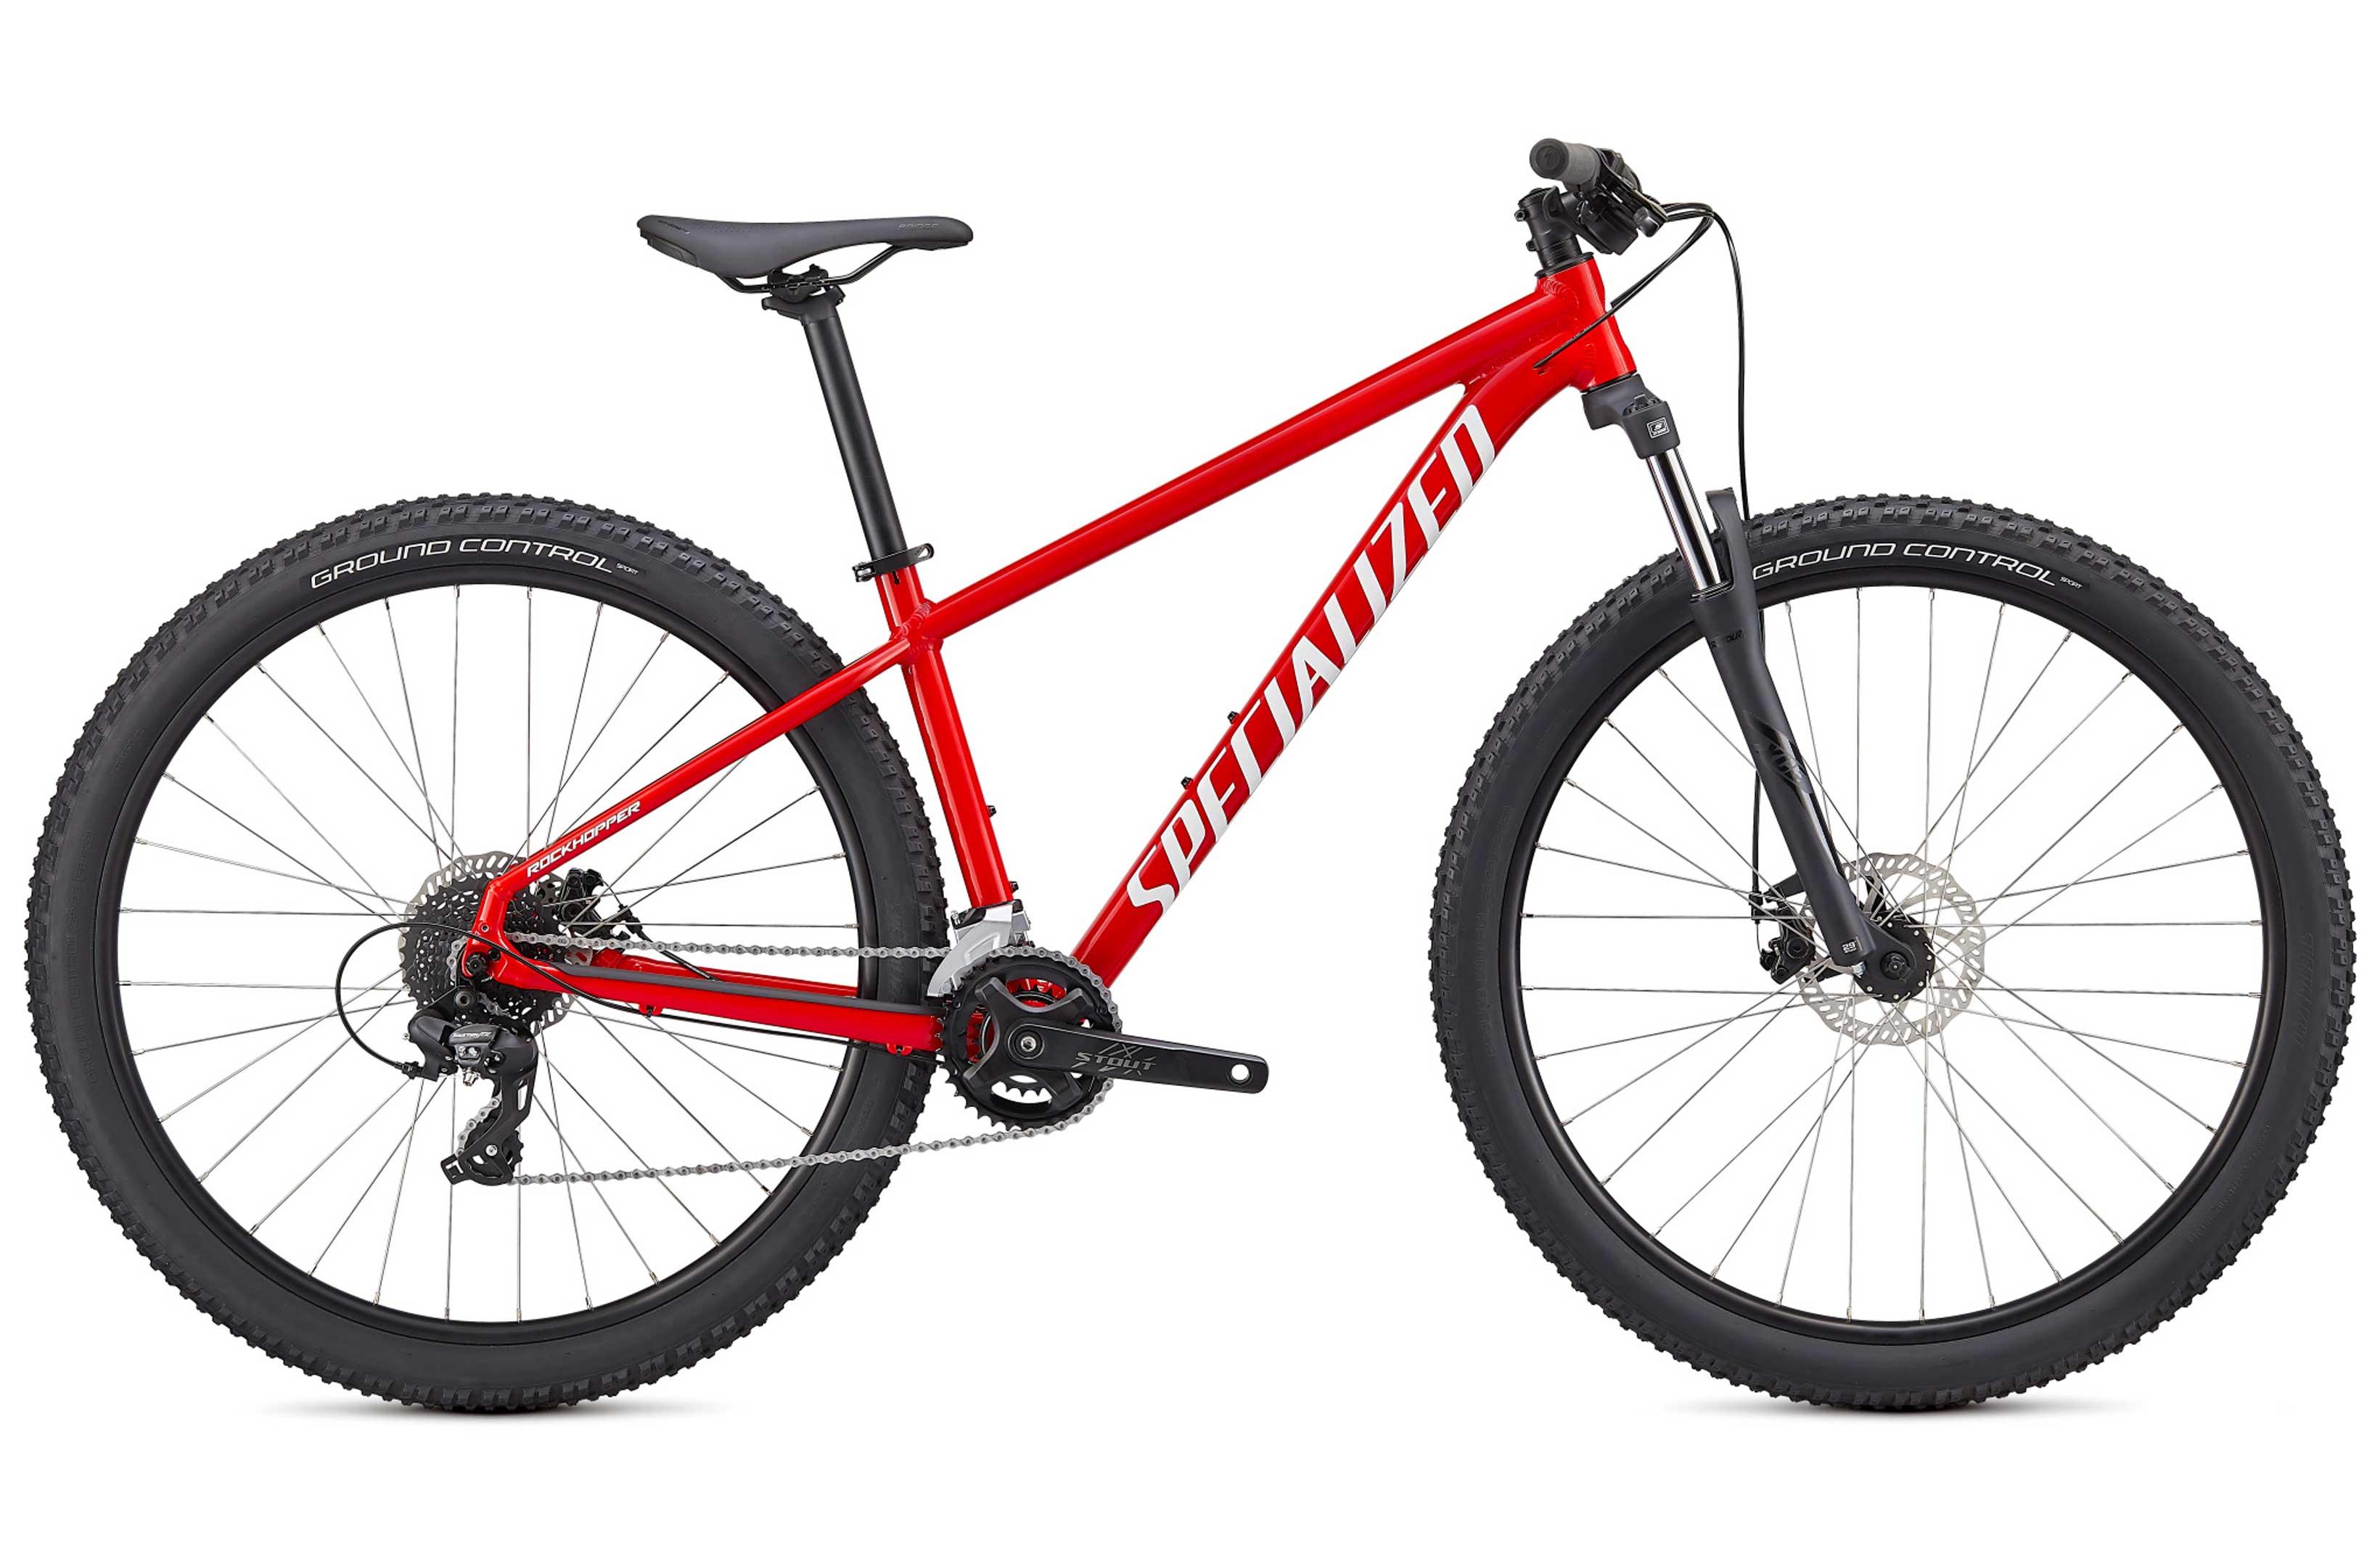 Specialized Rockhopper 27.5 Hardtail Mountain Bike 2021 Flo Red/White